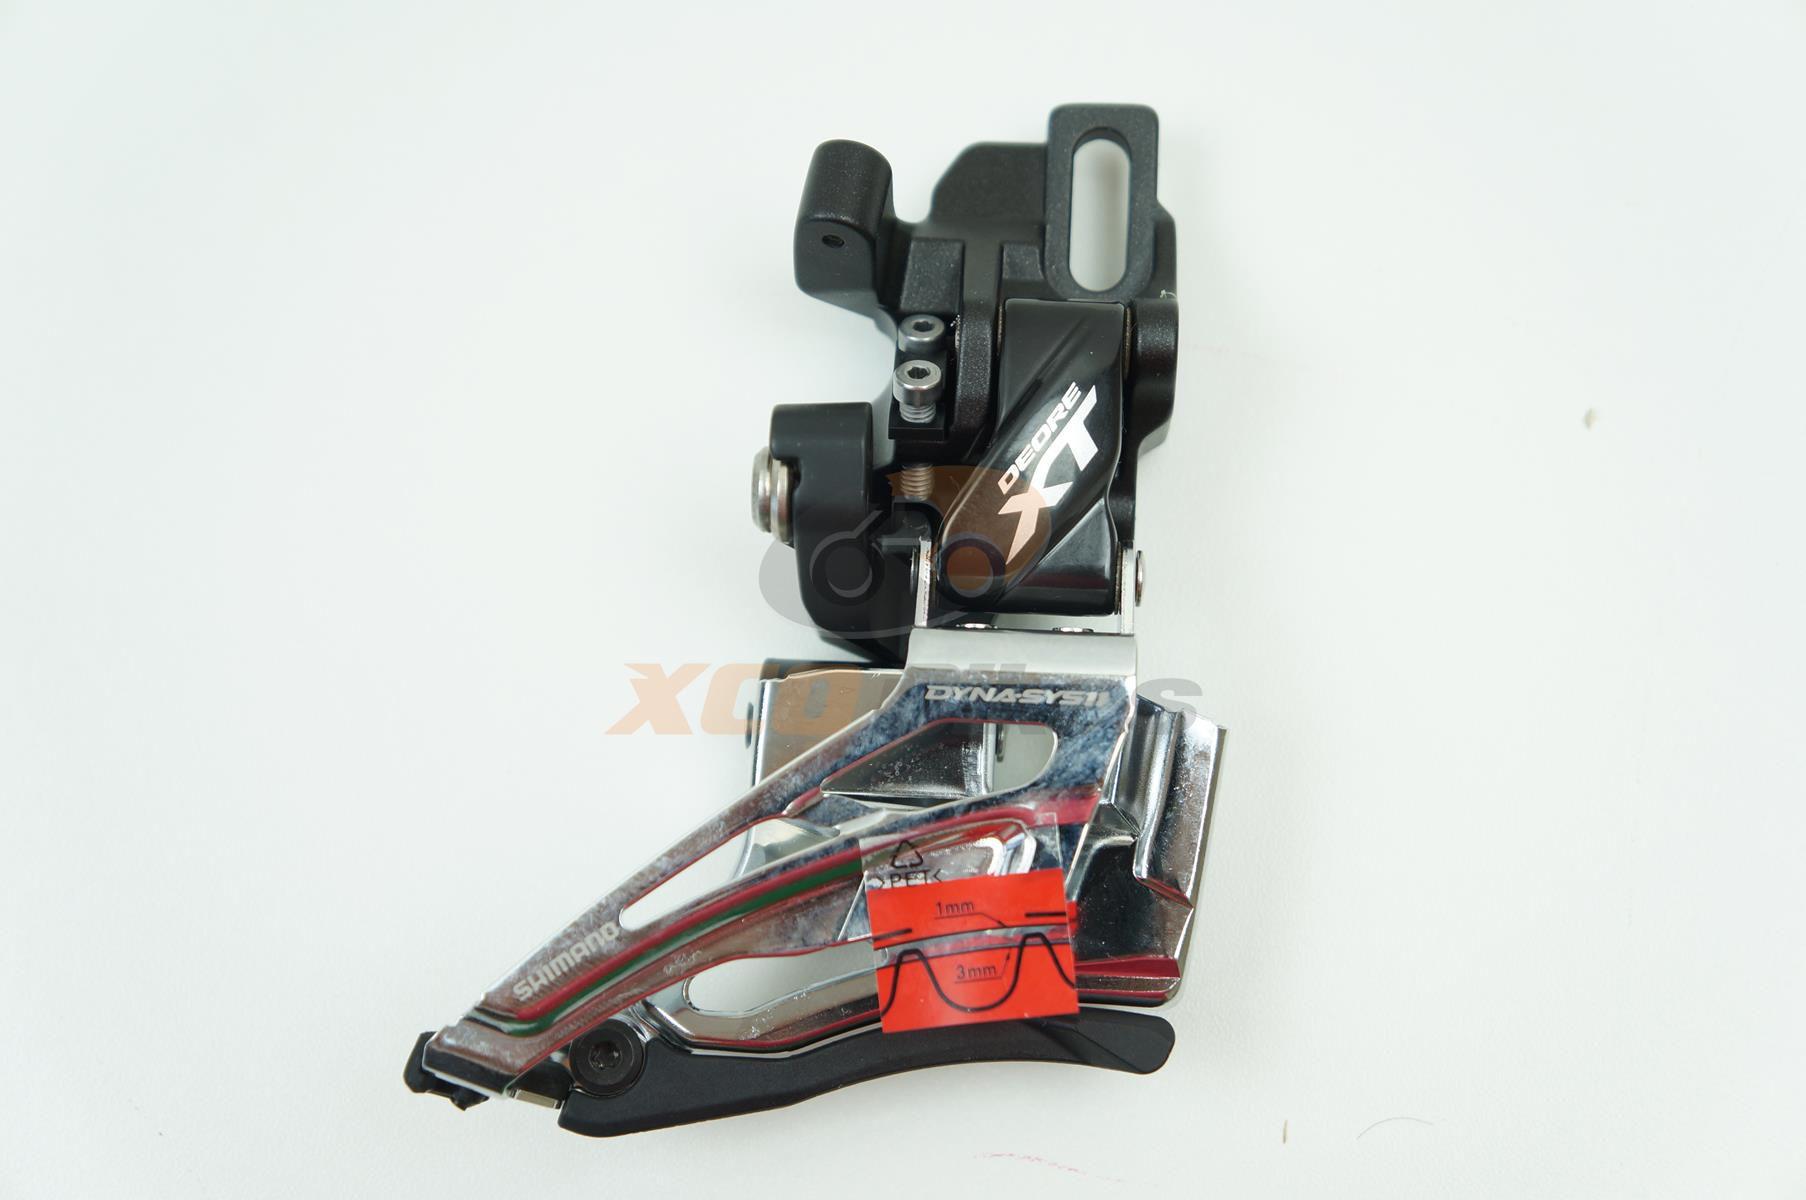 Cambio Dianteiro Shimano Deore XT M8025-D 2x11 Direct Mount Top Pull